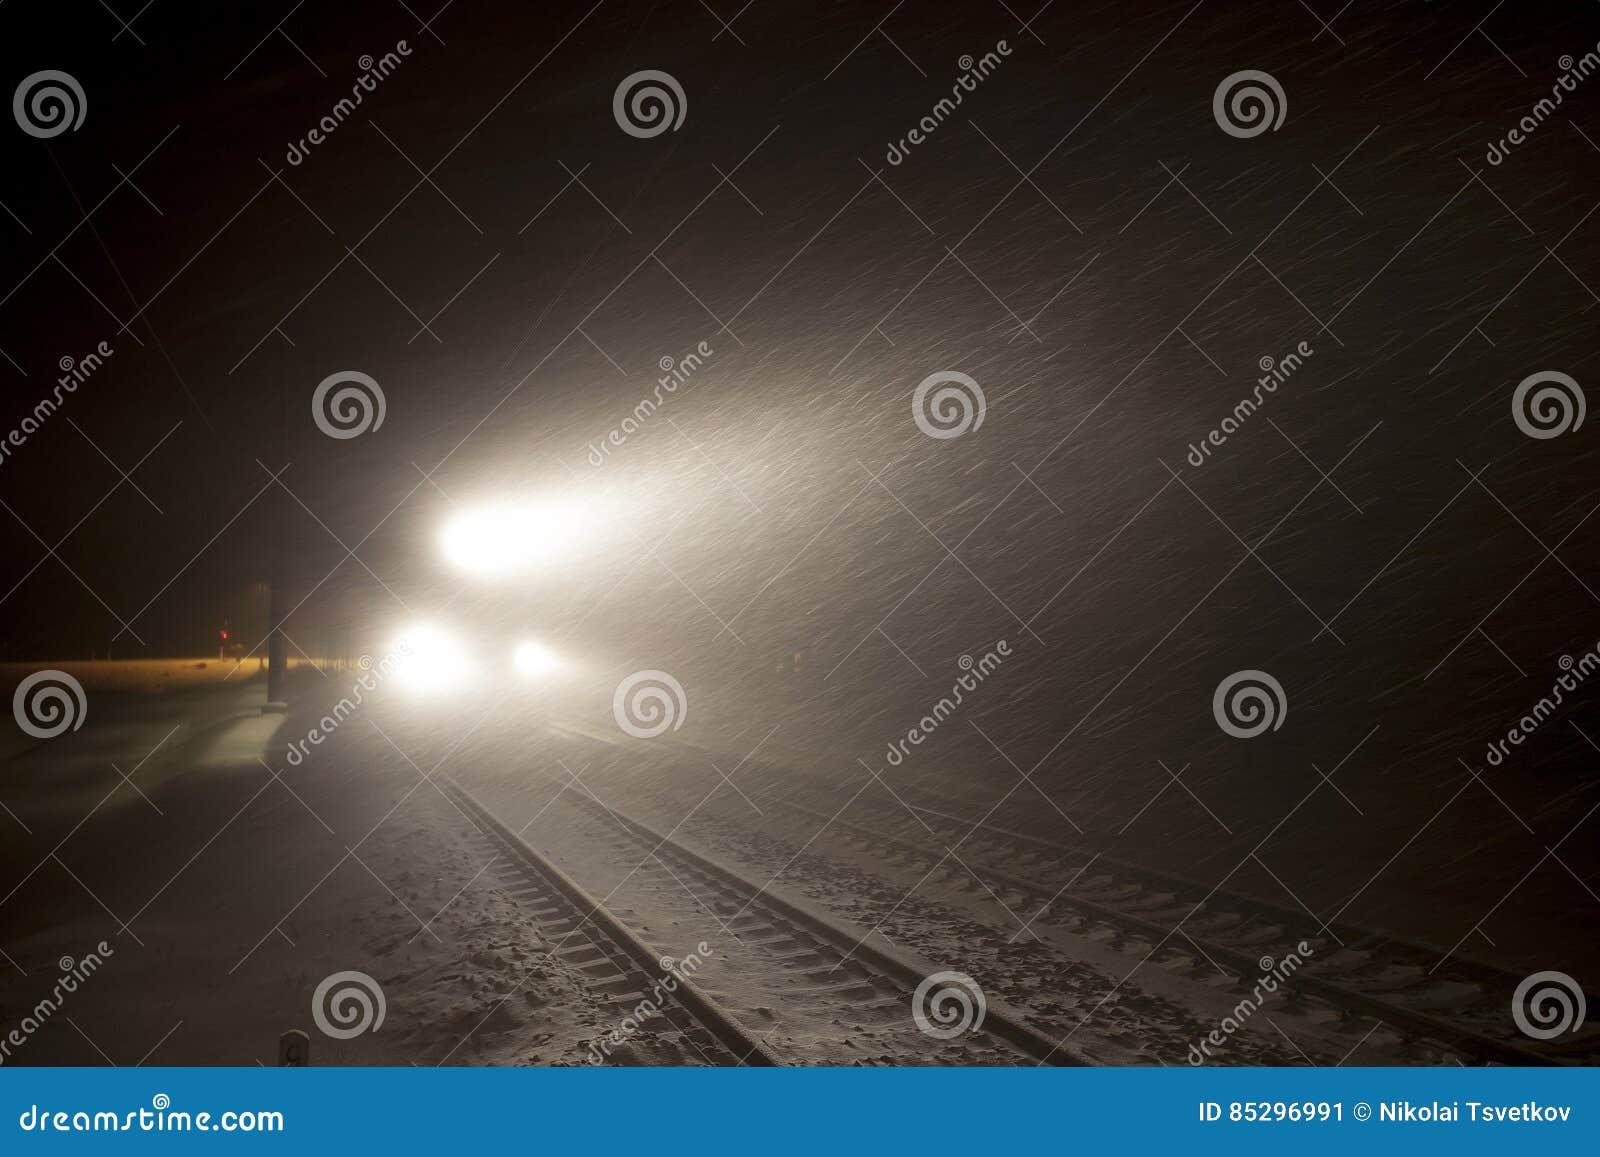 Headlights Of Train Stock Image Cargo Headlight 85296991 Head Lights For Model Trains